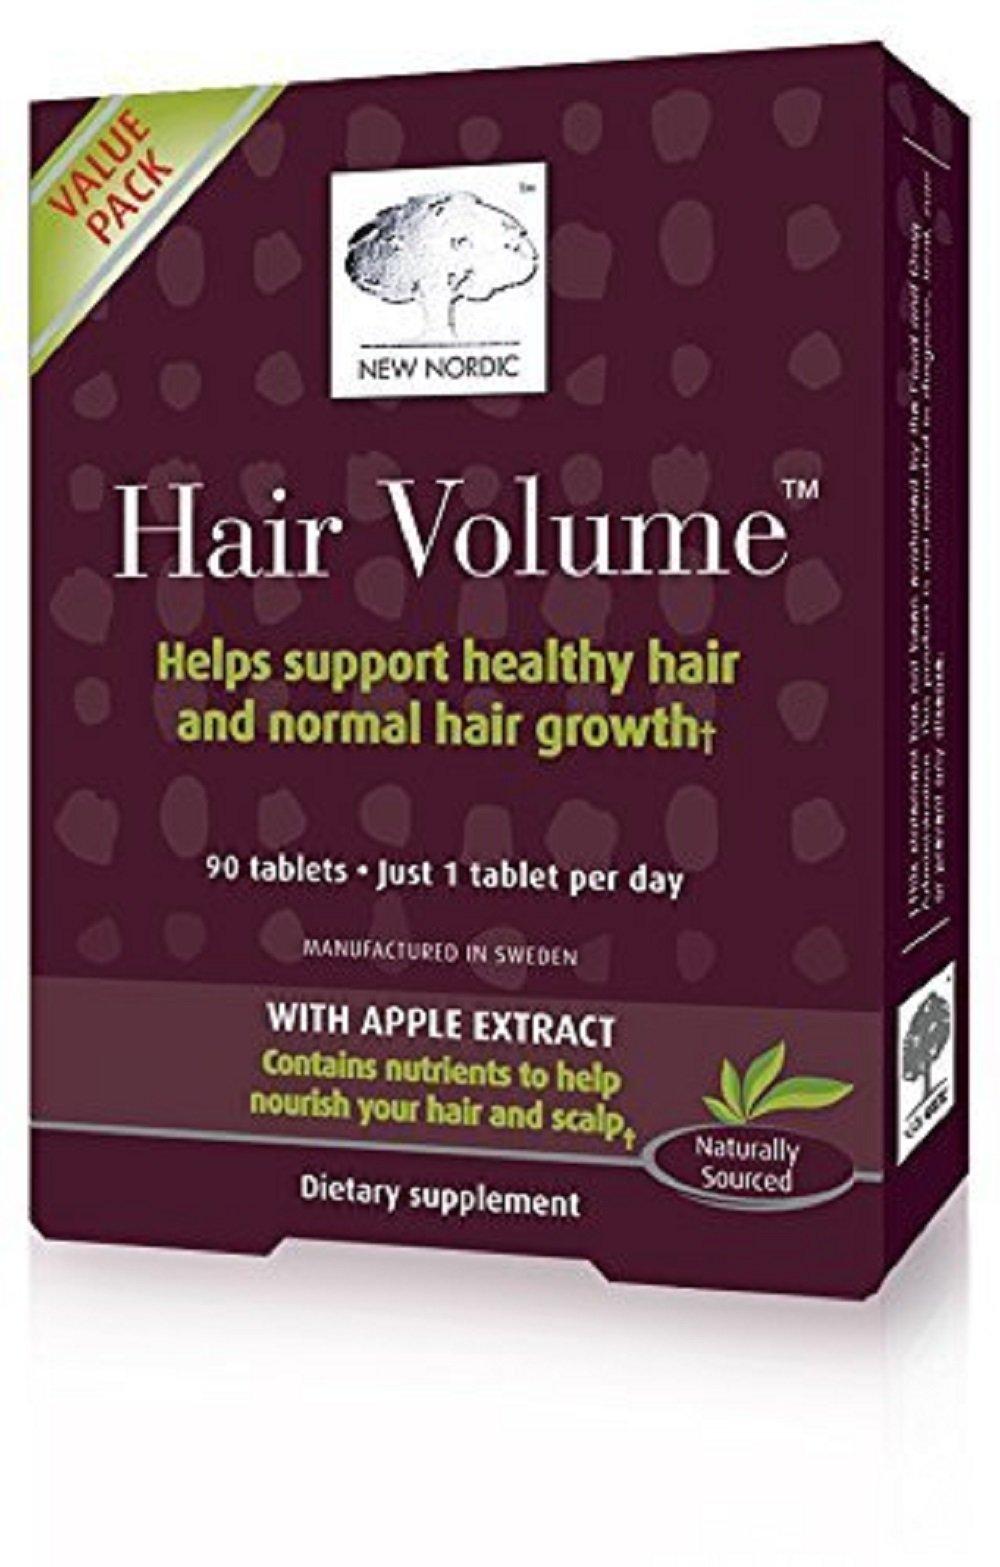 New Nordic Hair Volume 90 tabs